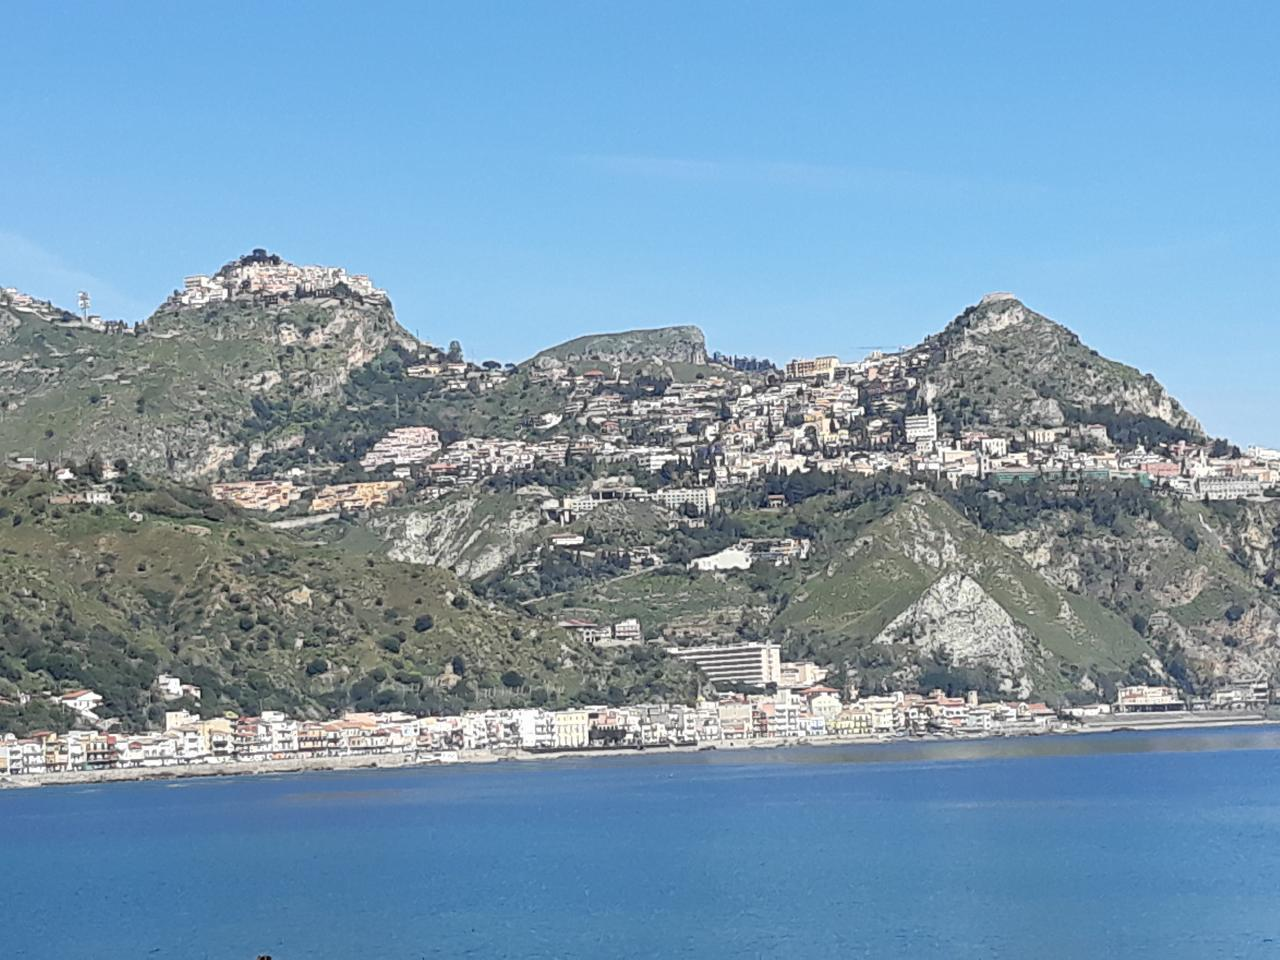 Appartement de vacances MARE - ETNA - TAORMINA (2618228), Mascali, Catania, Sicile, Italie, image 31